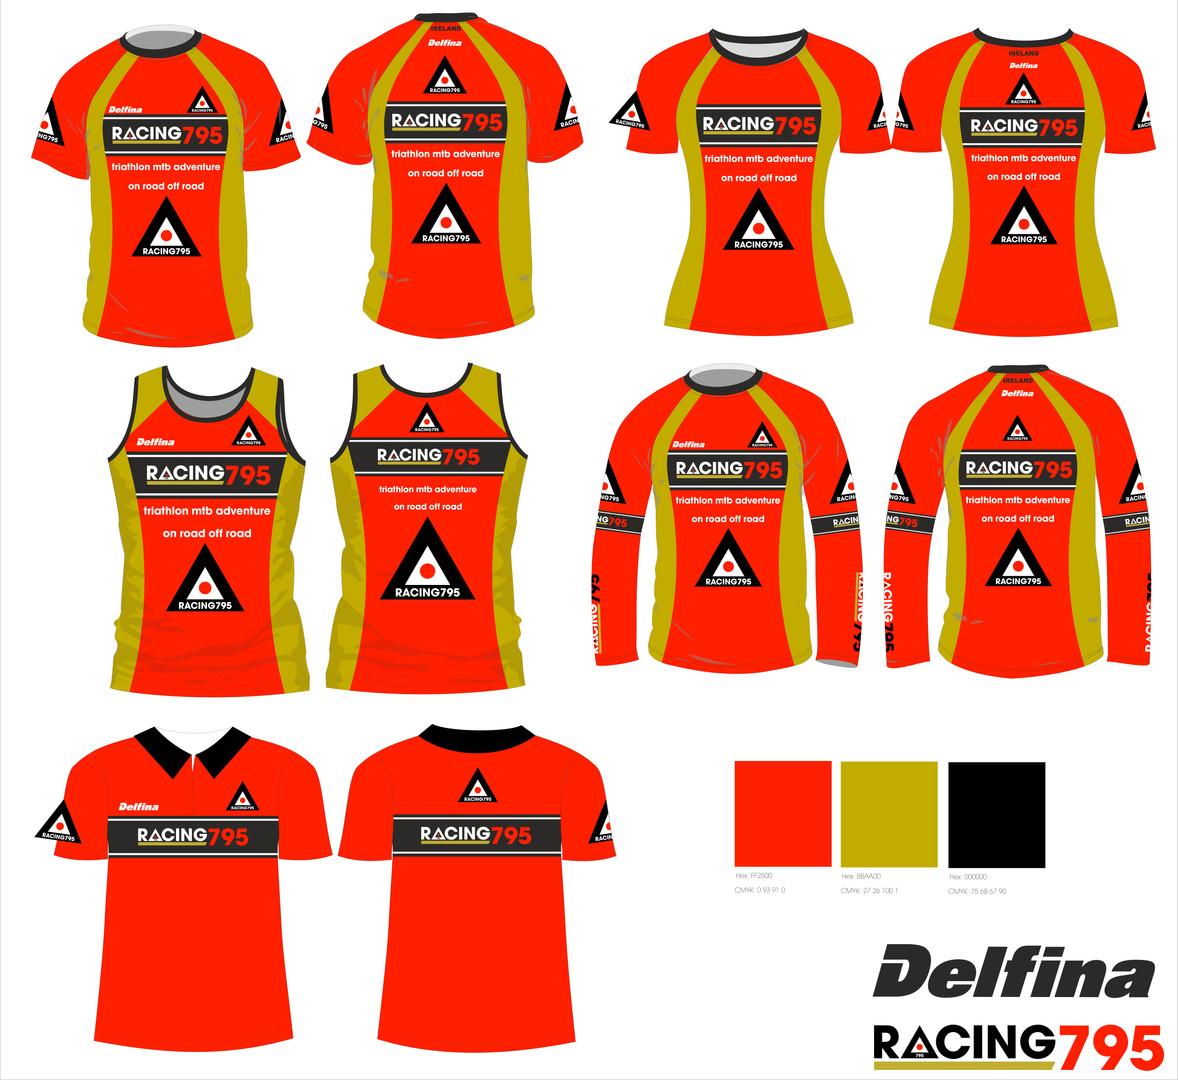 Racing 795 Triathlon customised print ki